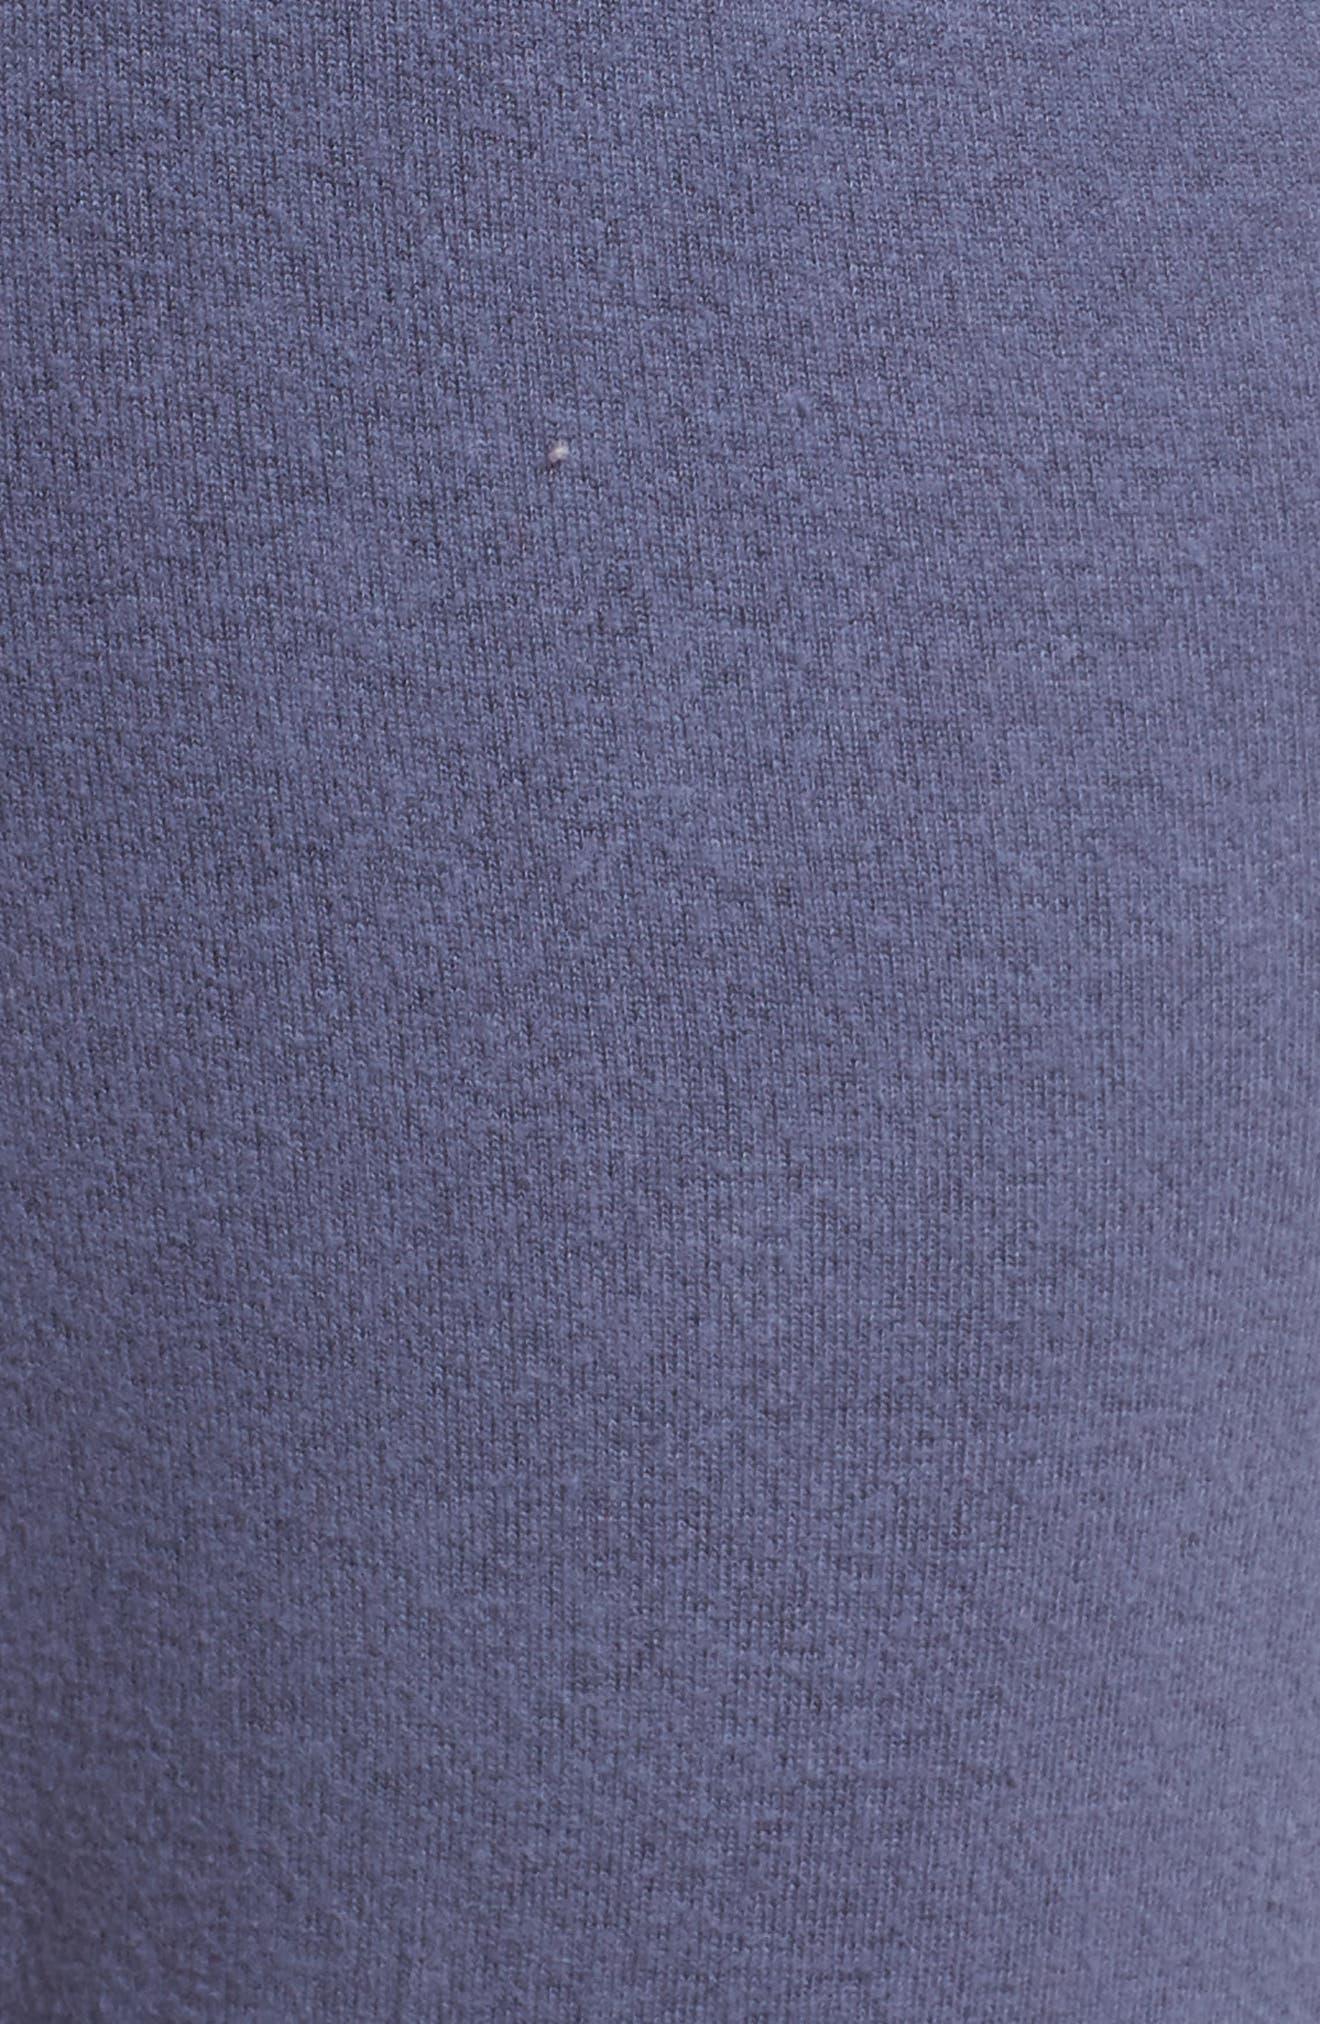 Good Vibes Jogger Pants,                             Alternate thumbnail 5, color,                             BLUE SHADOW